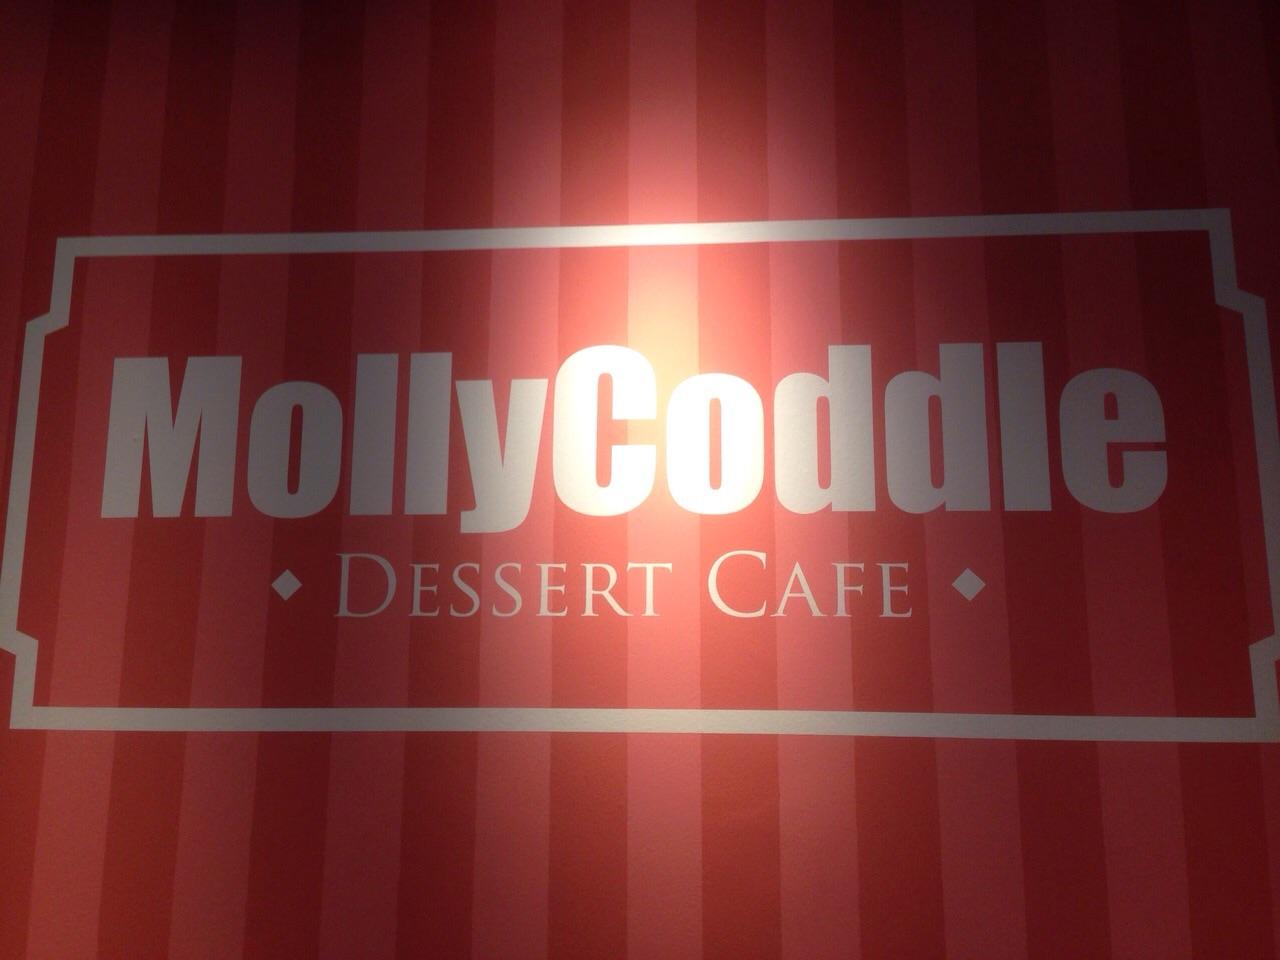 Molly Coddle Cafe